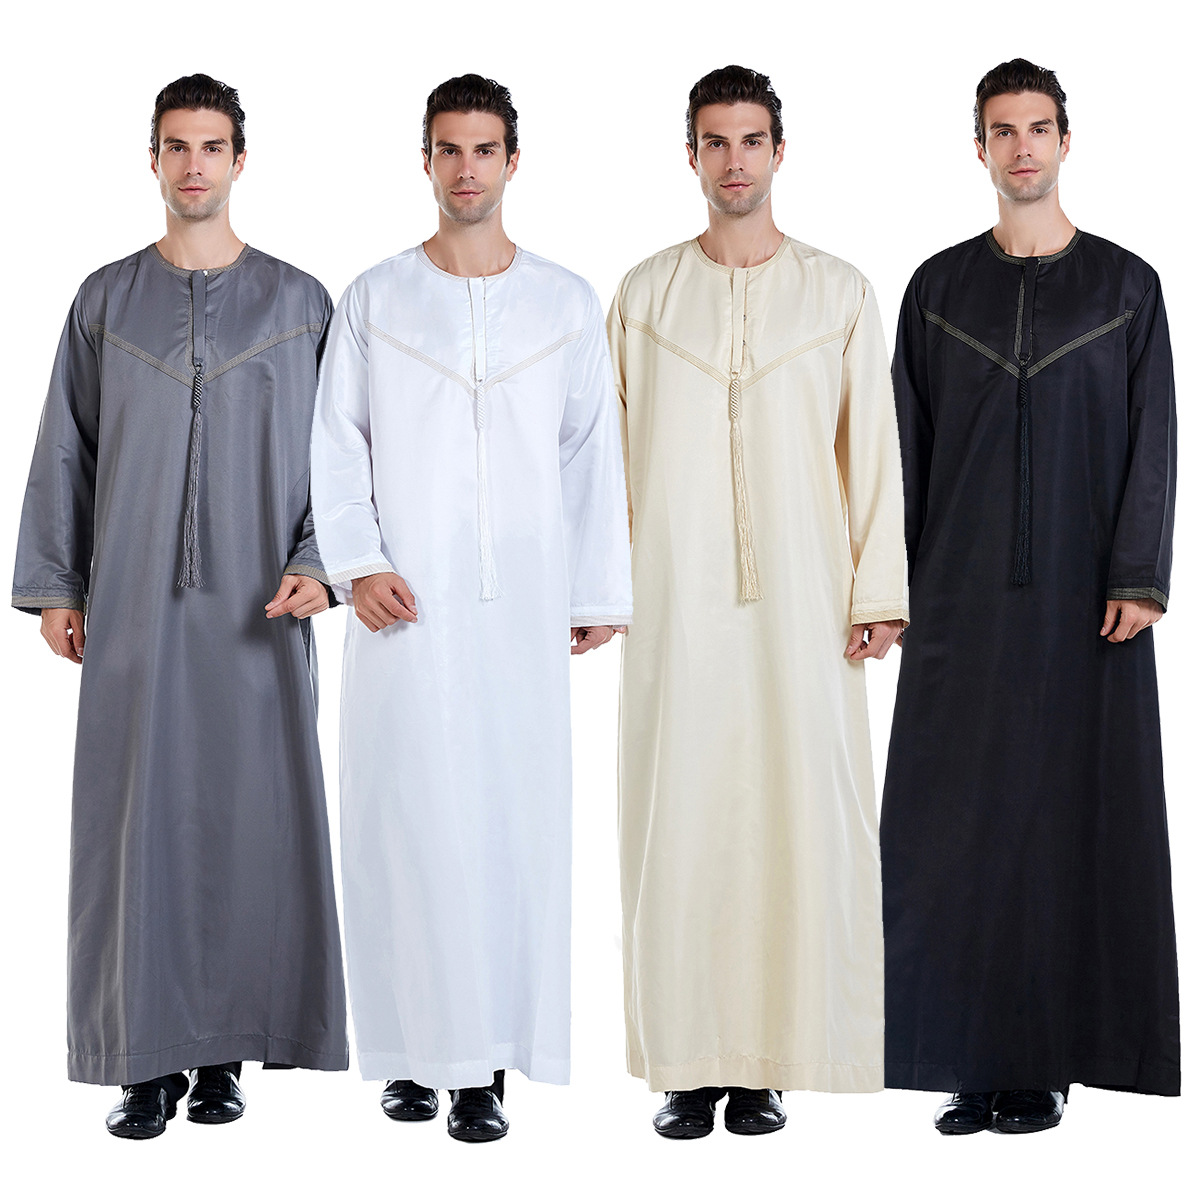 Muslim Dress Men Arabic Islamic Clothes Islamic Clothing Saudi Arabia Abaya  Thobe Mens Arab Les Vetement Adulte Homme Pakistan